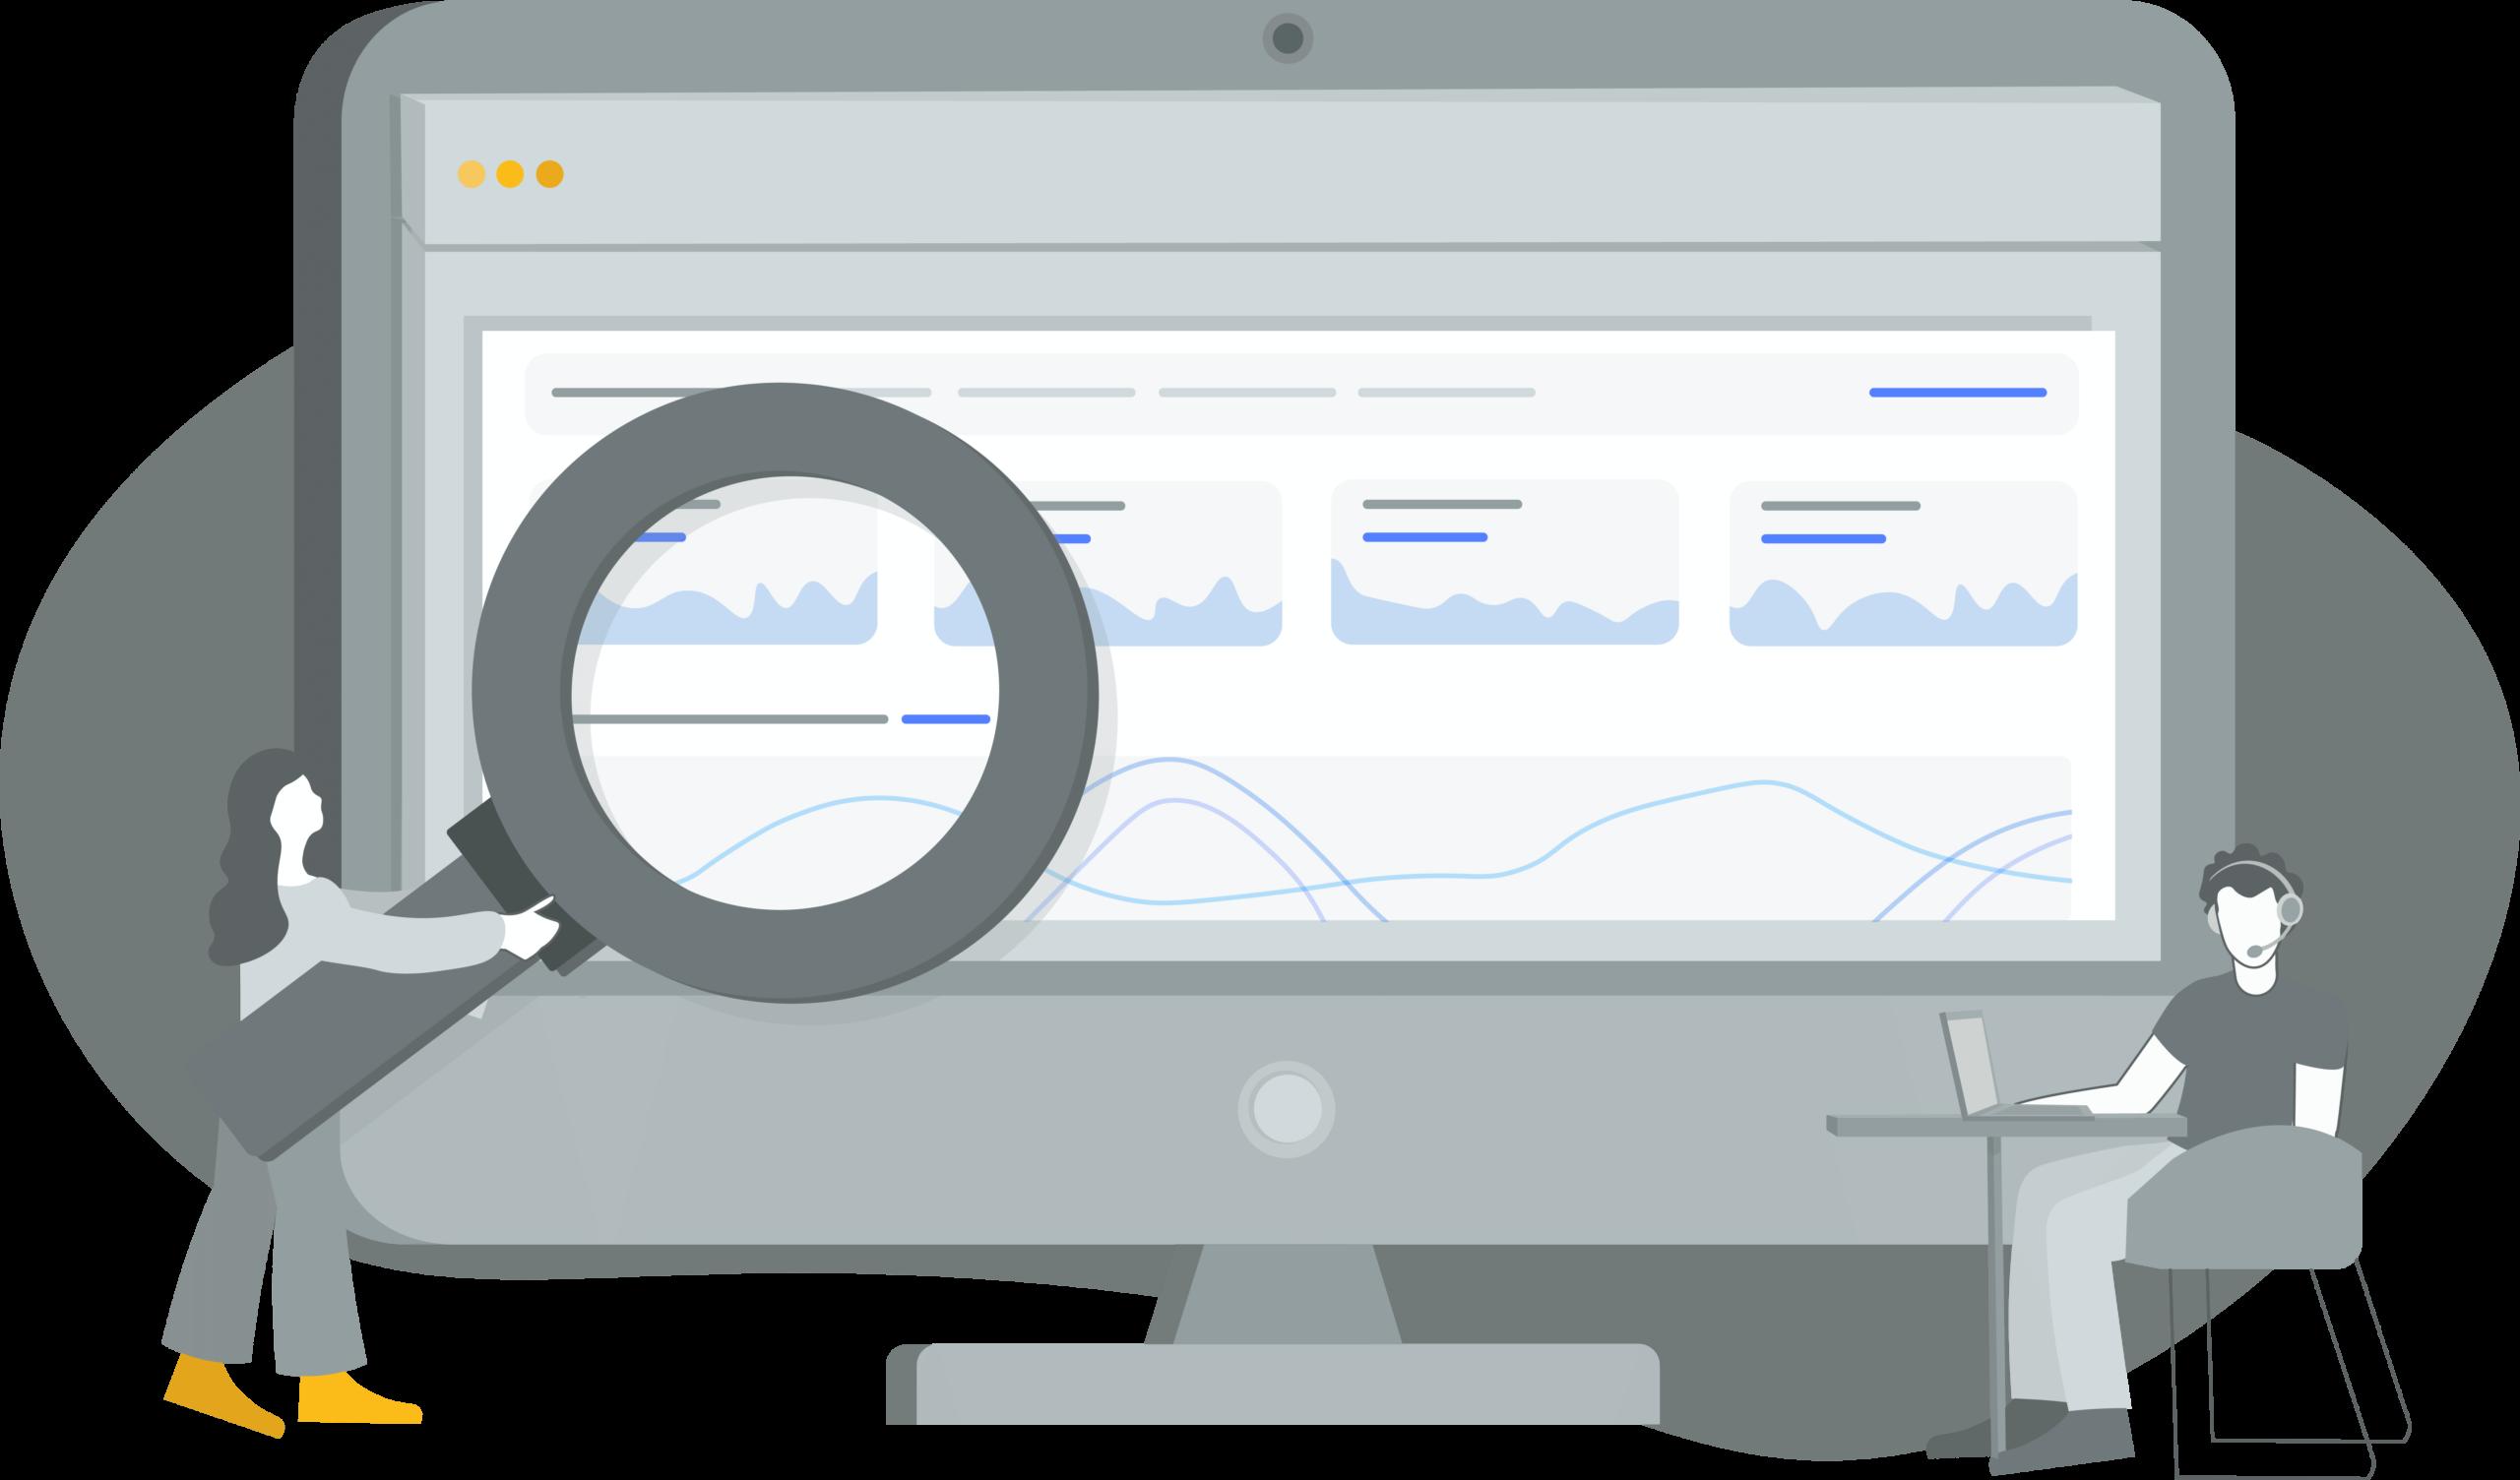 Support dashboard illustration